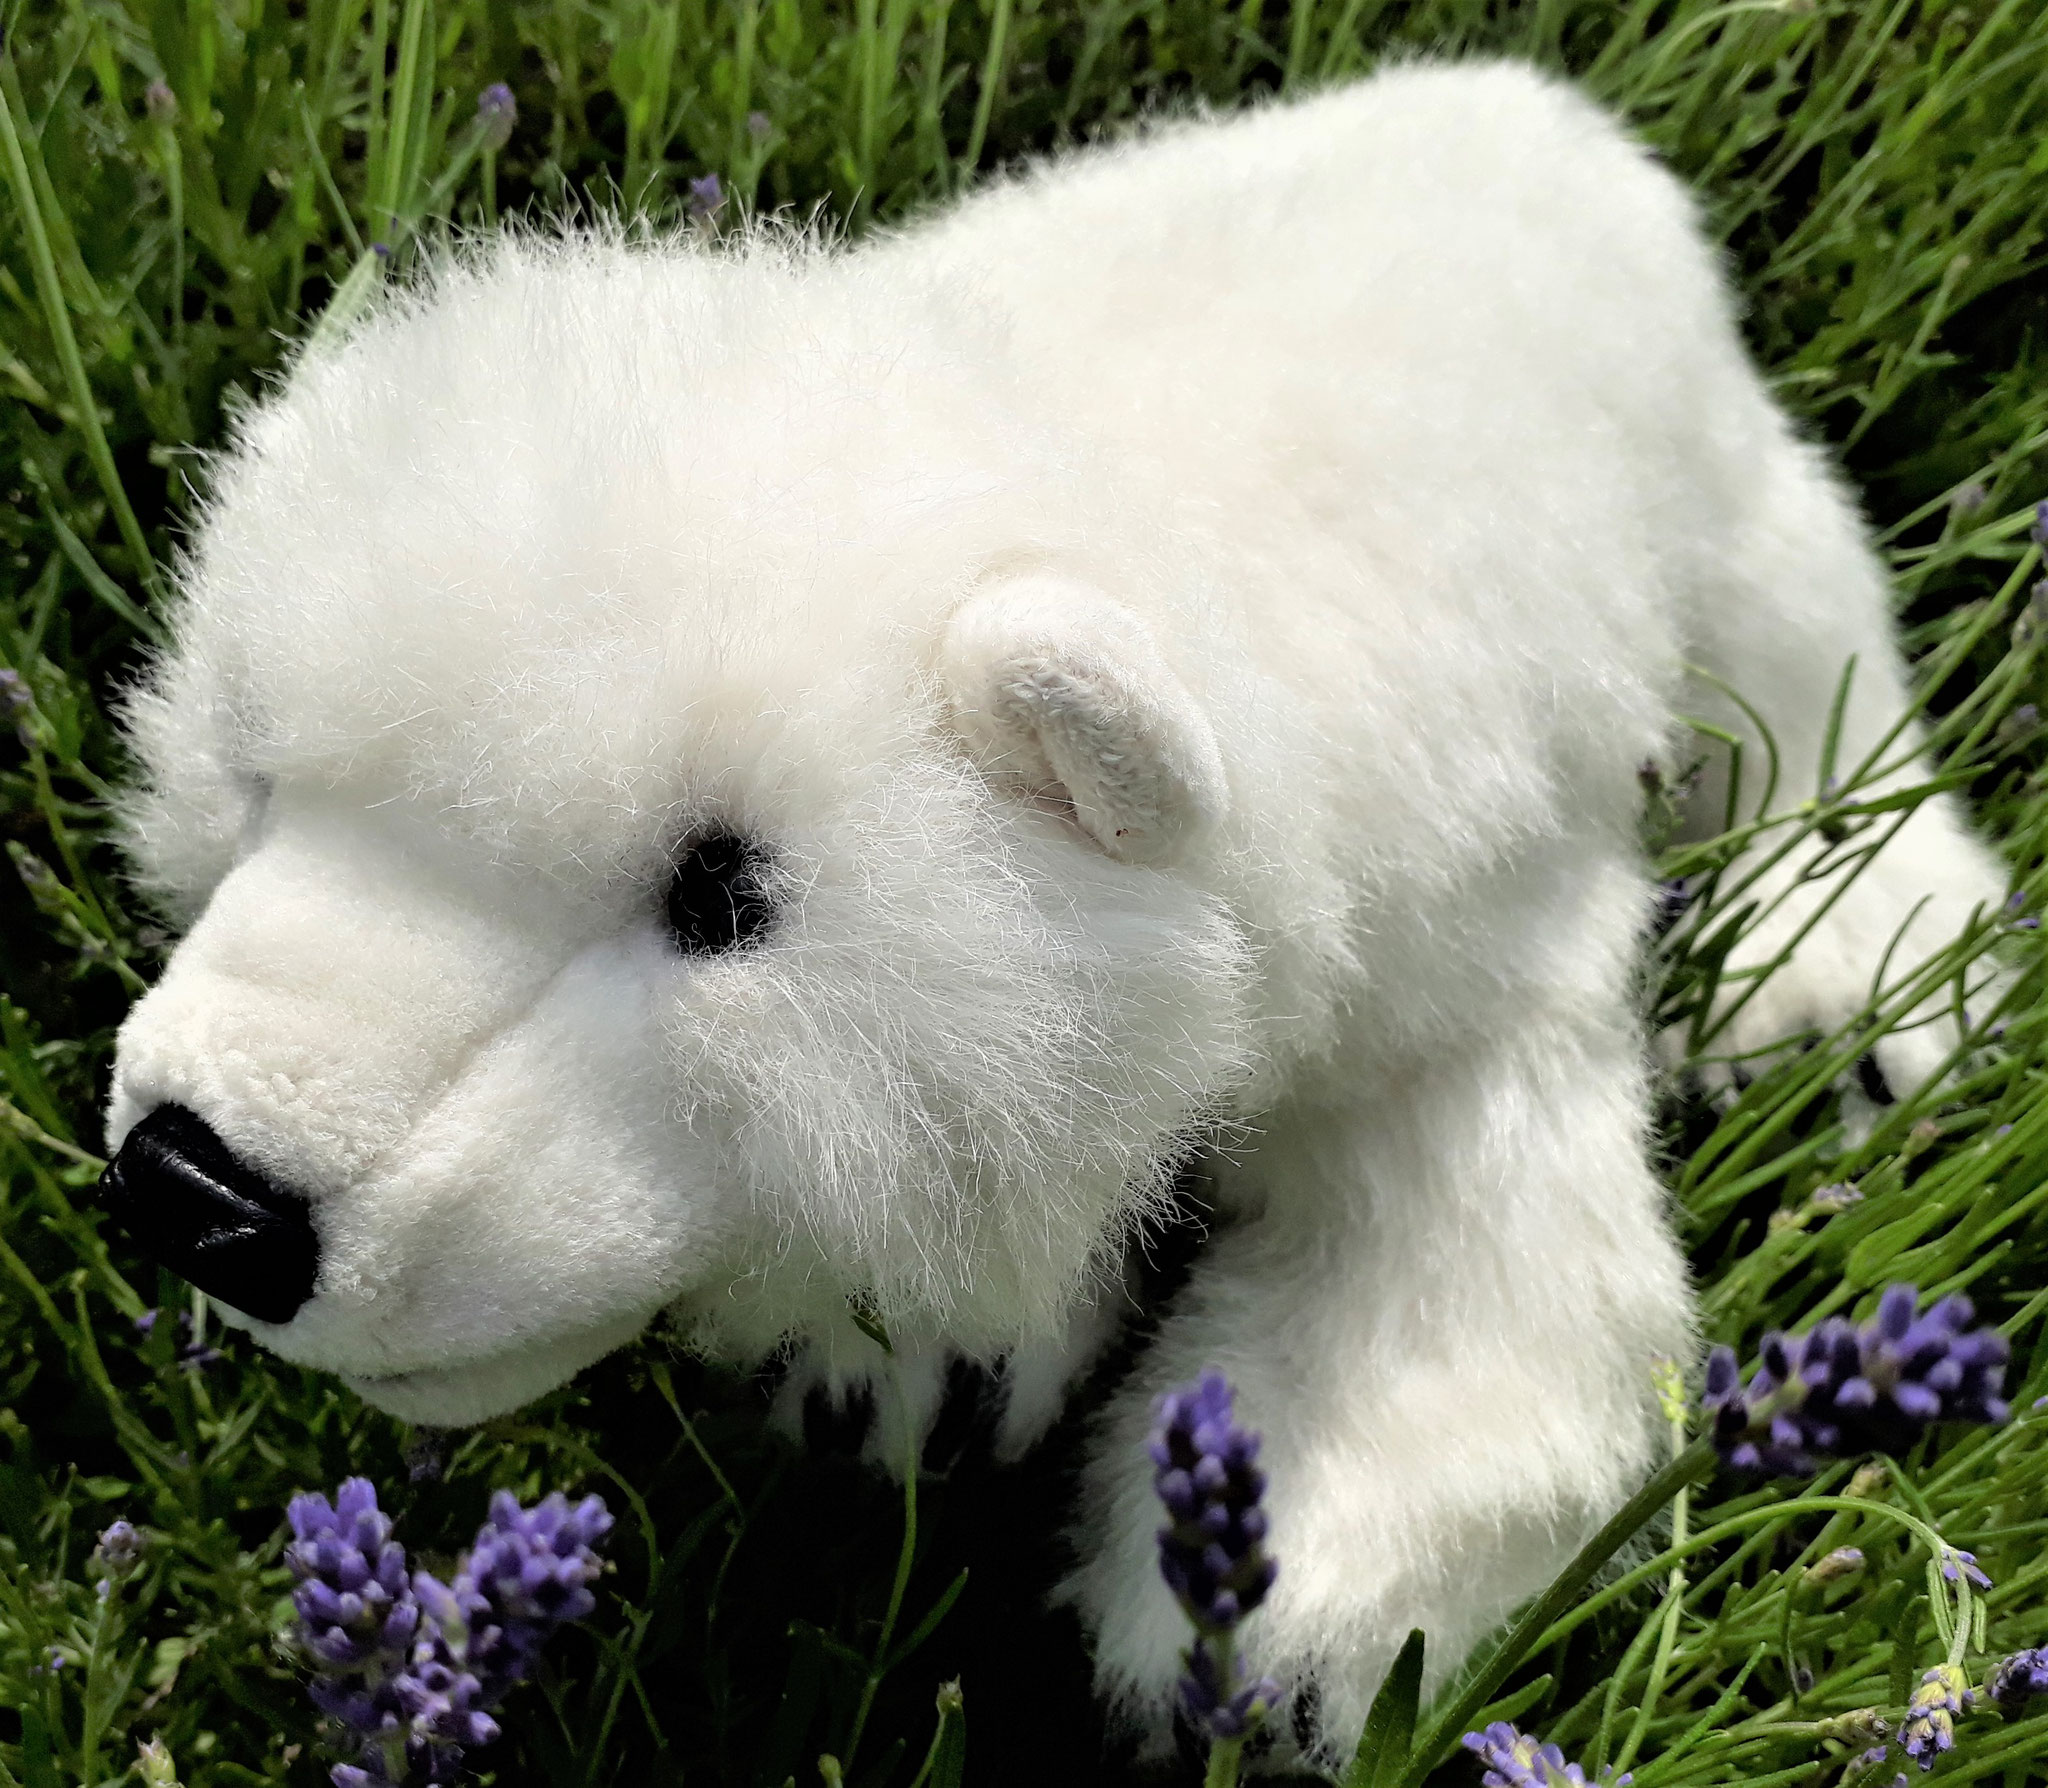 Klasse 1a - Klassenlehrerin Frau Münch - Klassentier Ole, der Eisbär